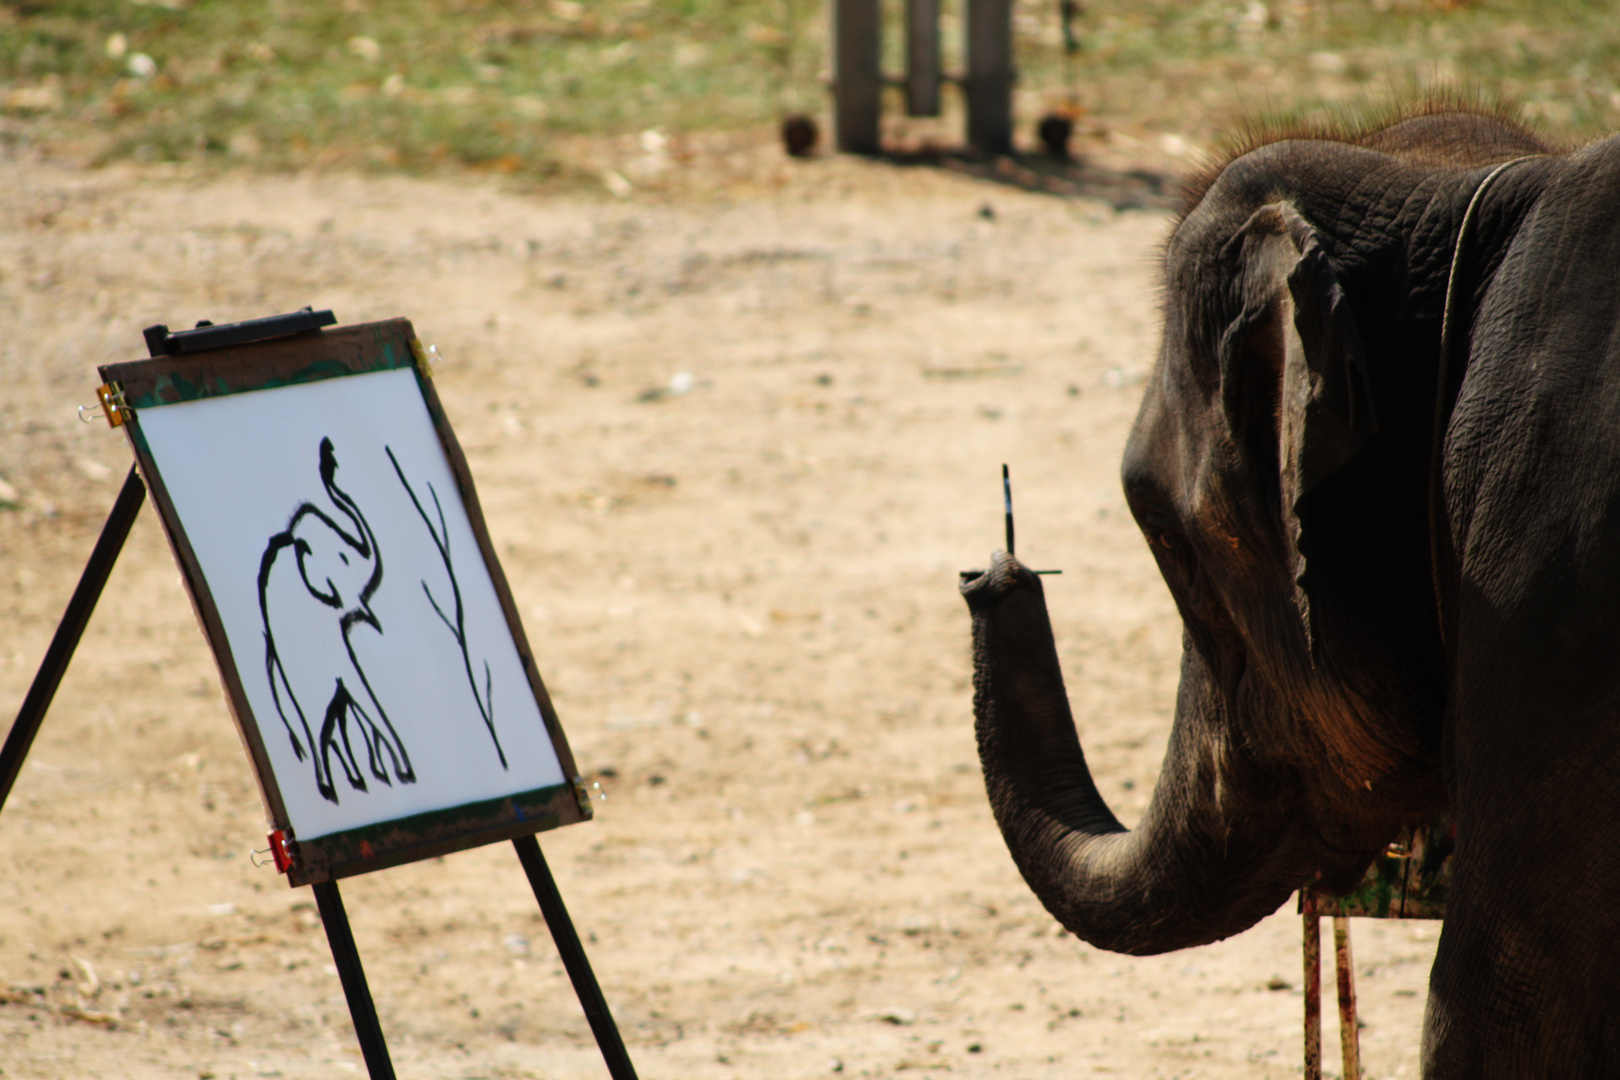 Picasso reincarnated as an elephant???